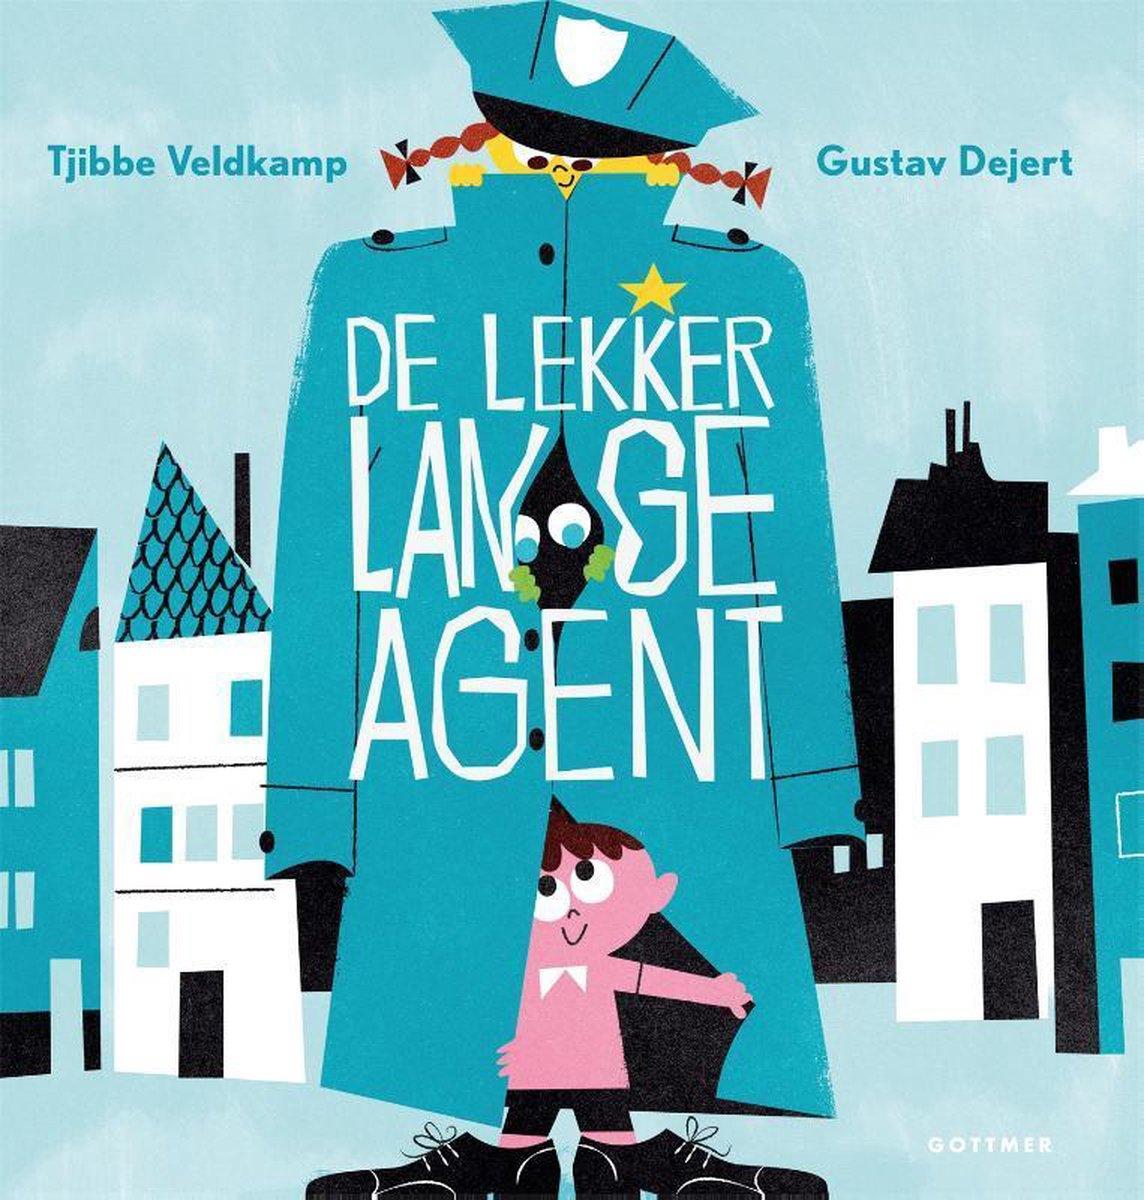 bol.com | De lekker lange agent, Tjibbe Veldkamp | 9789025765521 | Boeken